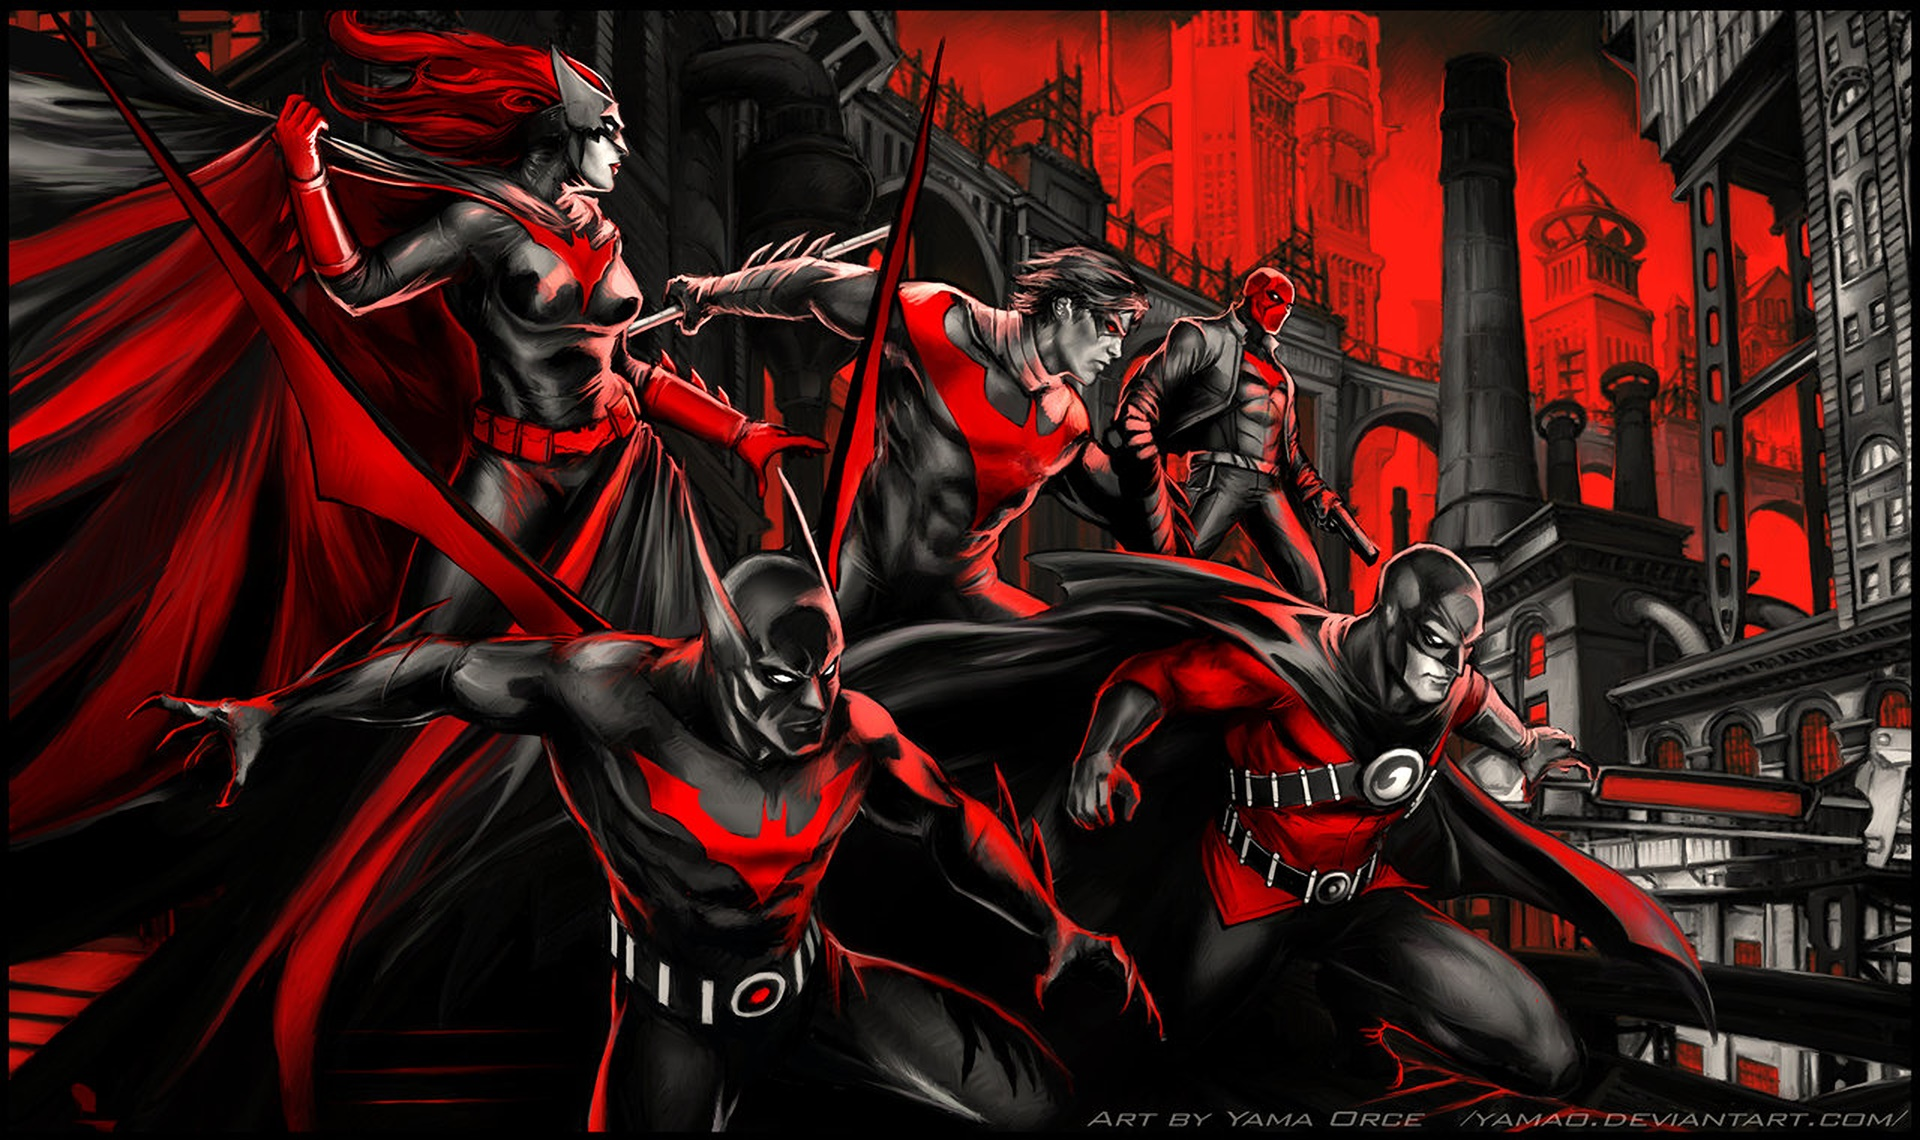 General 1920x1140 artwork fan art Batman Batwoman Nightwing Red Hood Red Robin Batman Beyond